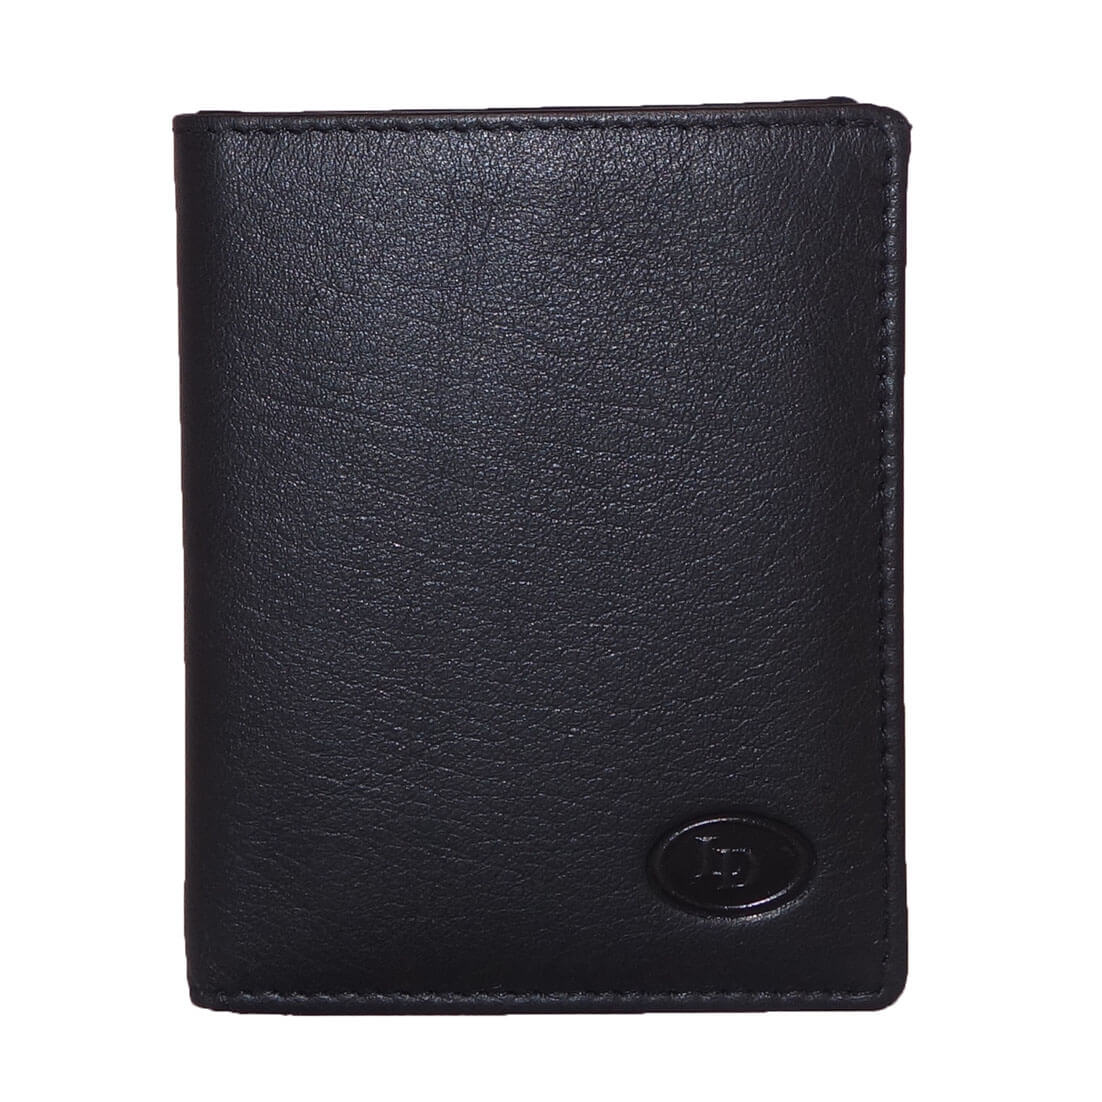 Leather Design Pasjeshouder / Portemonnee 1119 Zwart-9965